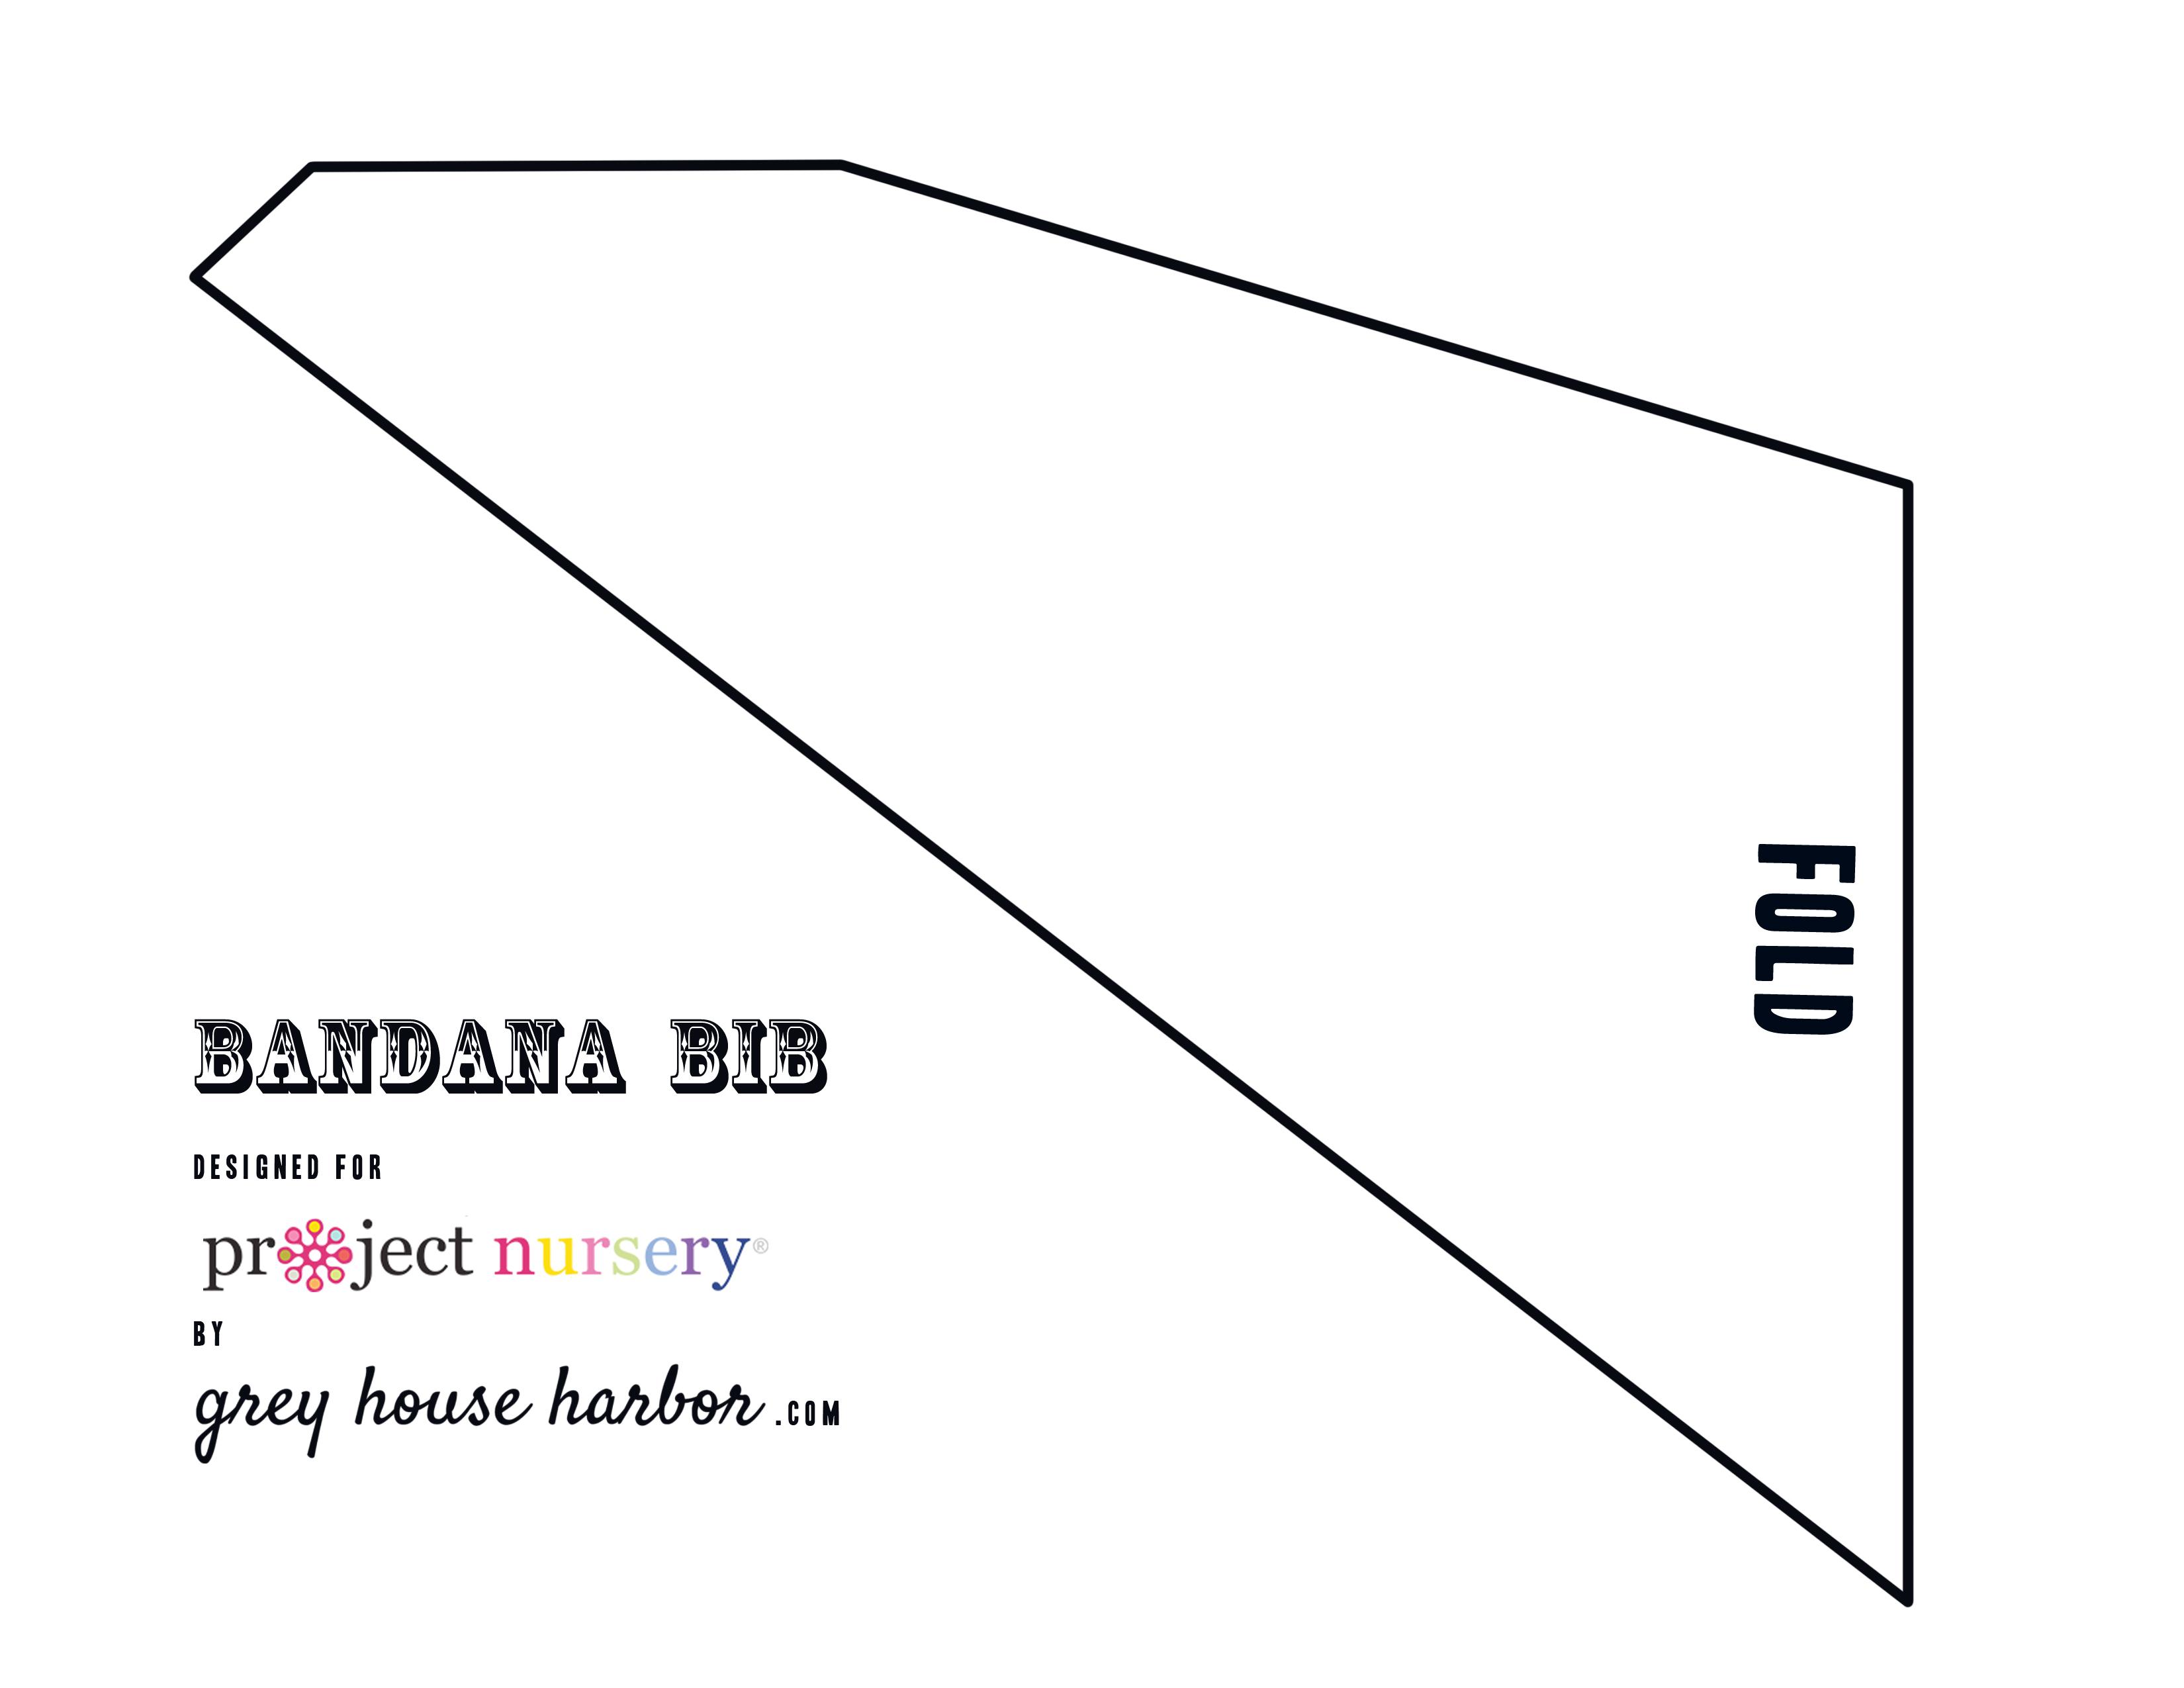 Diy : How To Sew A Bandana Bib - Project Nursery - Free Printable Baby Bandana Bib Pattern